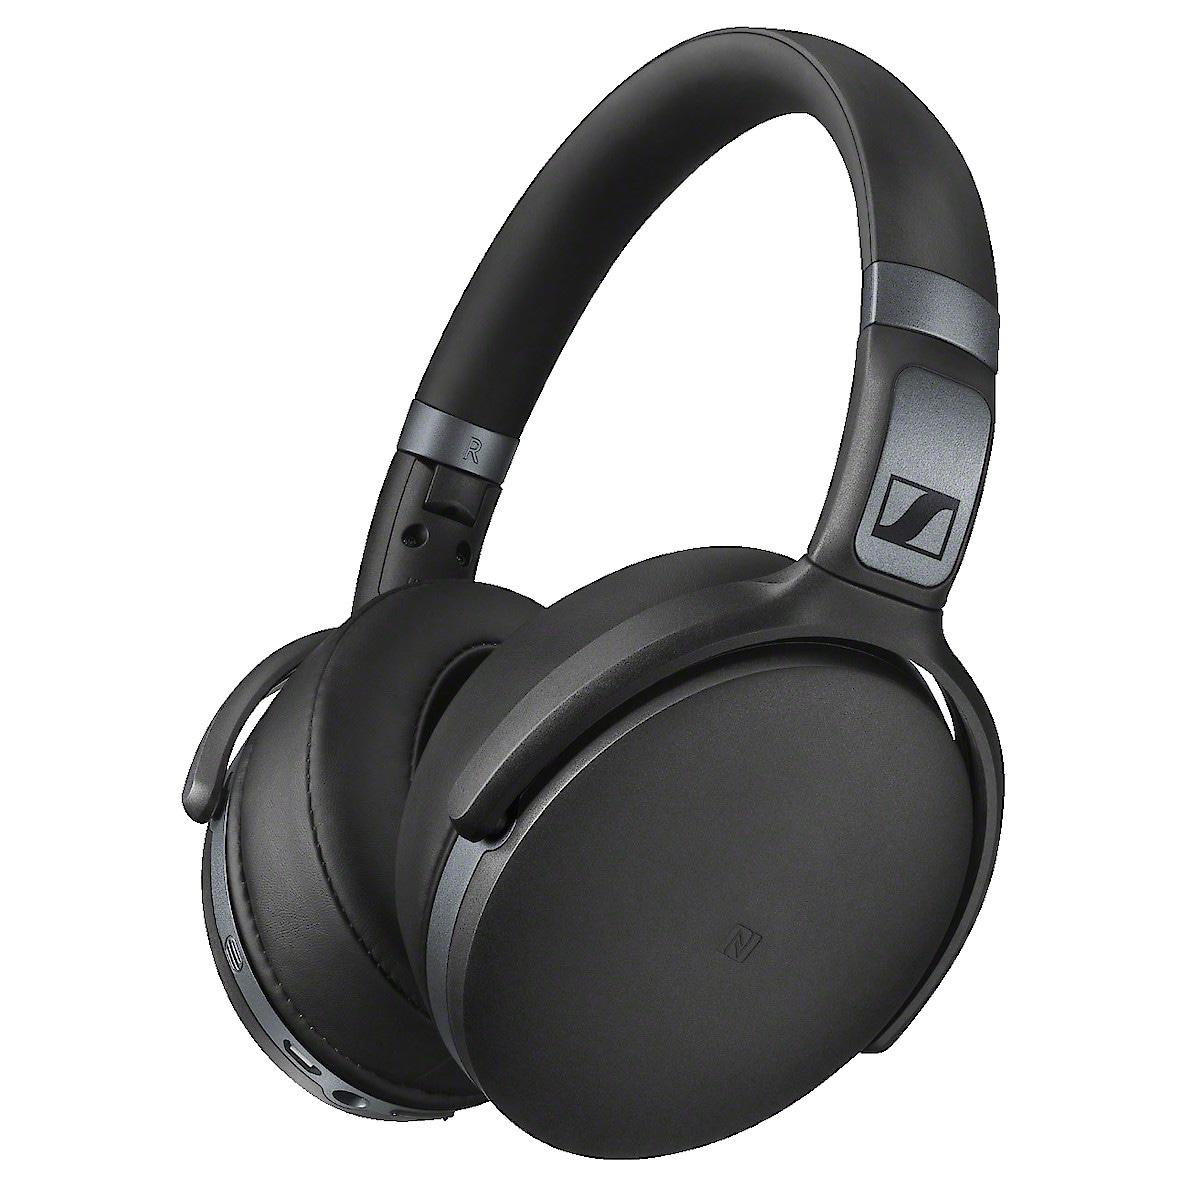 Drahtlose Kopfhörer mit Mikrofon, Sennheiser HD 4.40 BT